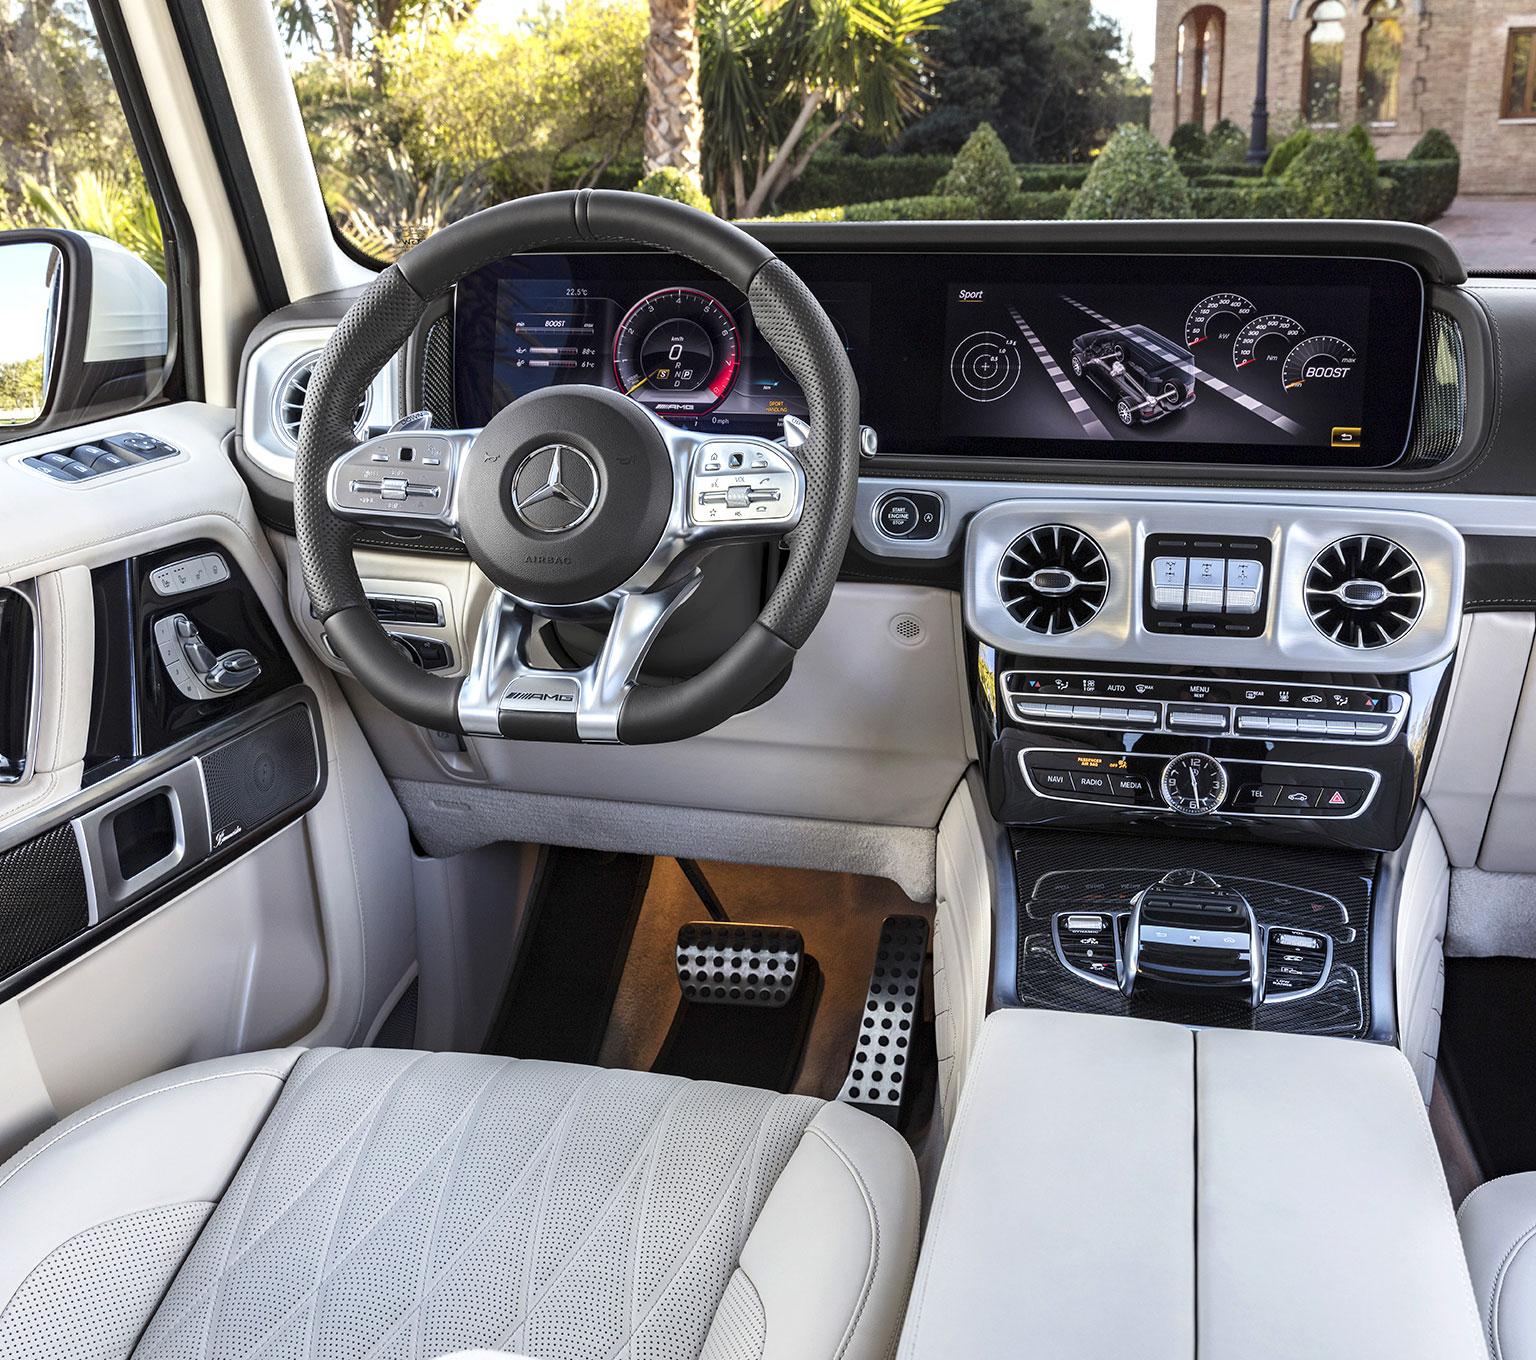 Mercedes-Benz - Home of C, E, S, CLS, CL, SLK, SL, R, GLK, M